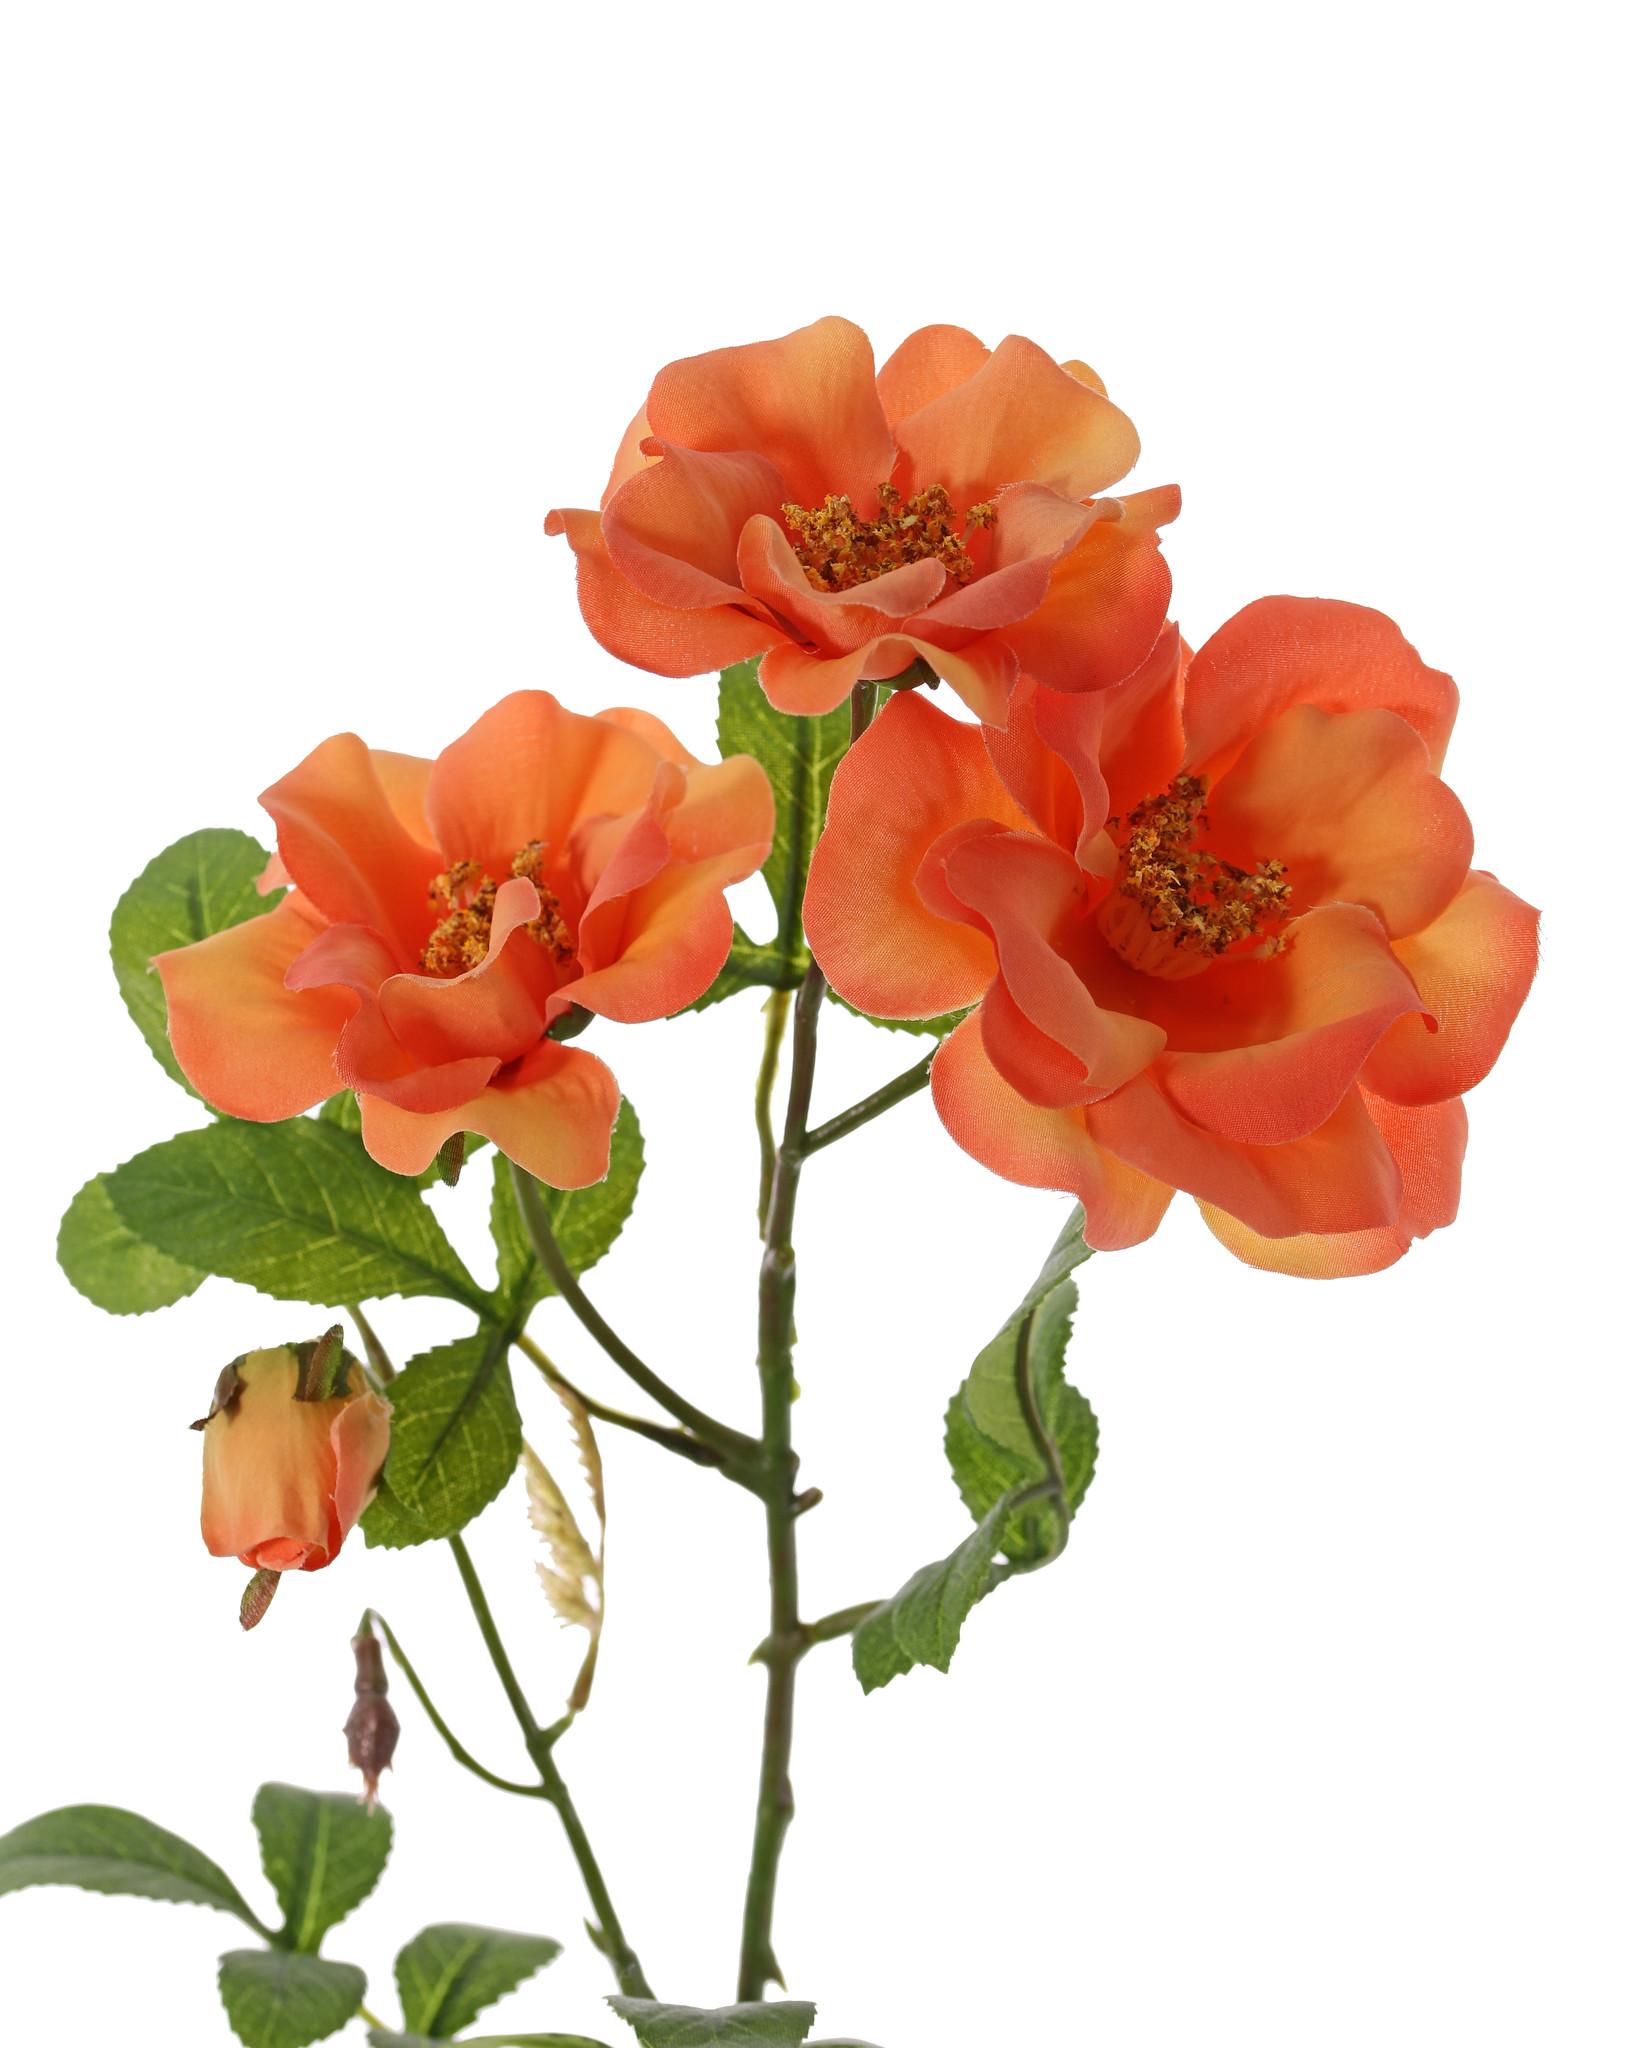 Rosa mosqueta (Rosa rubiginosa), 3 flores (2x Ø 9cm, 1x Ø 7cm) & 1 brote, 24 hojas (6 sets), 60cm